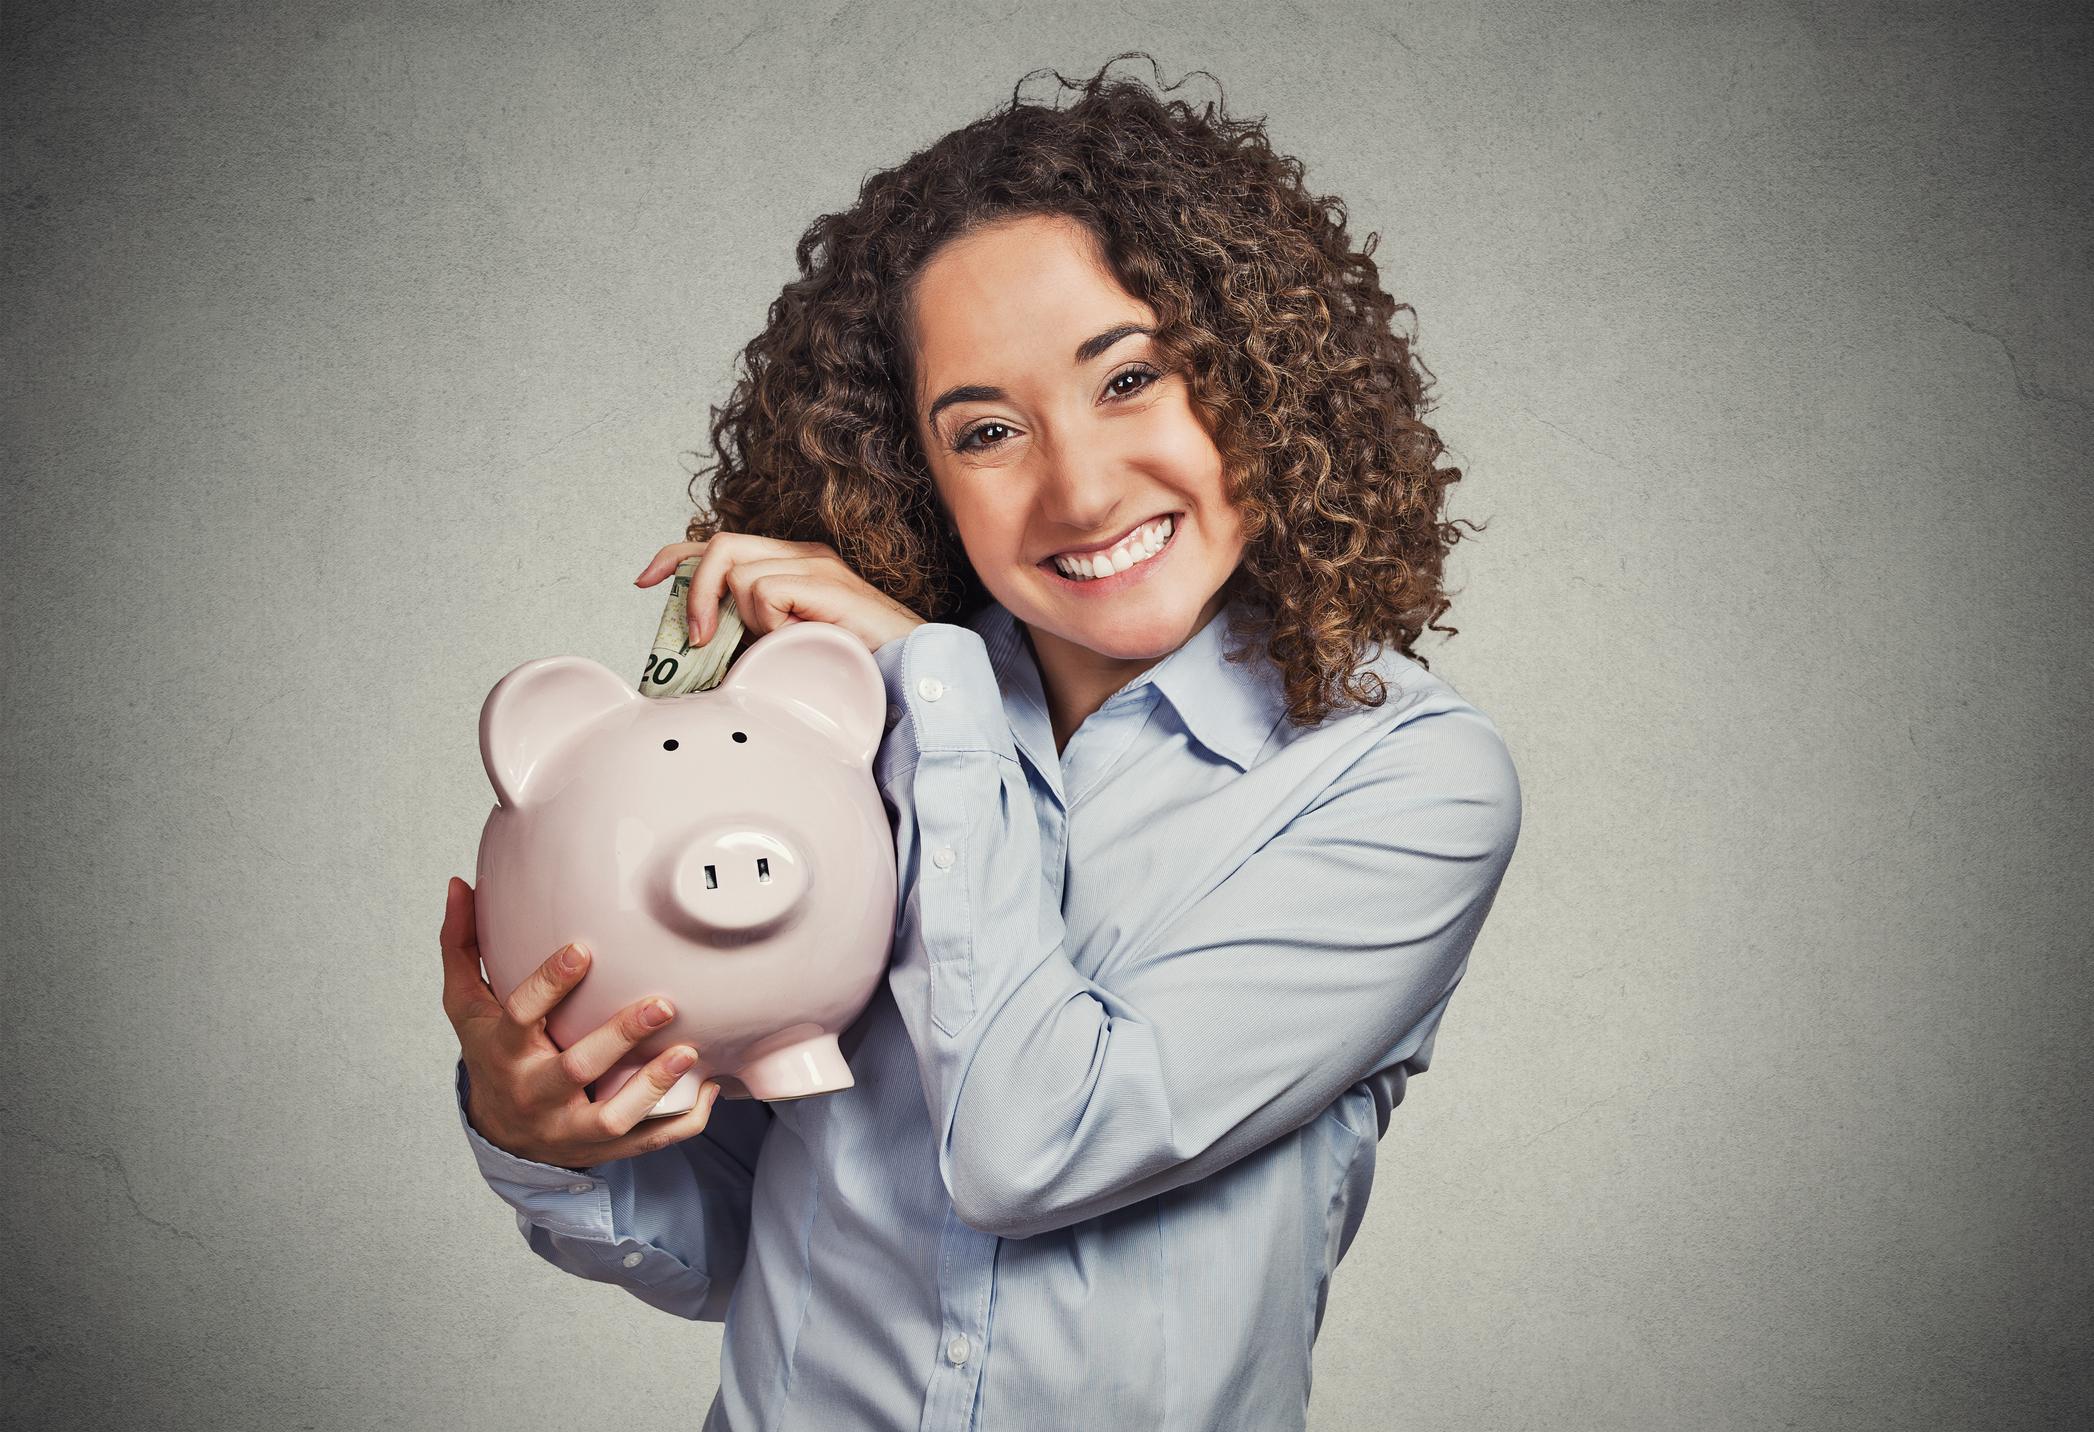 Woman putting money into savings account